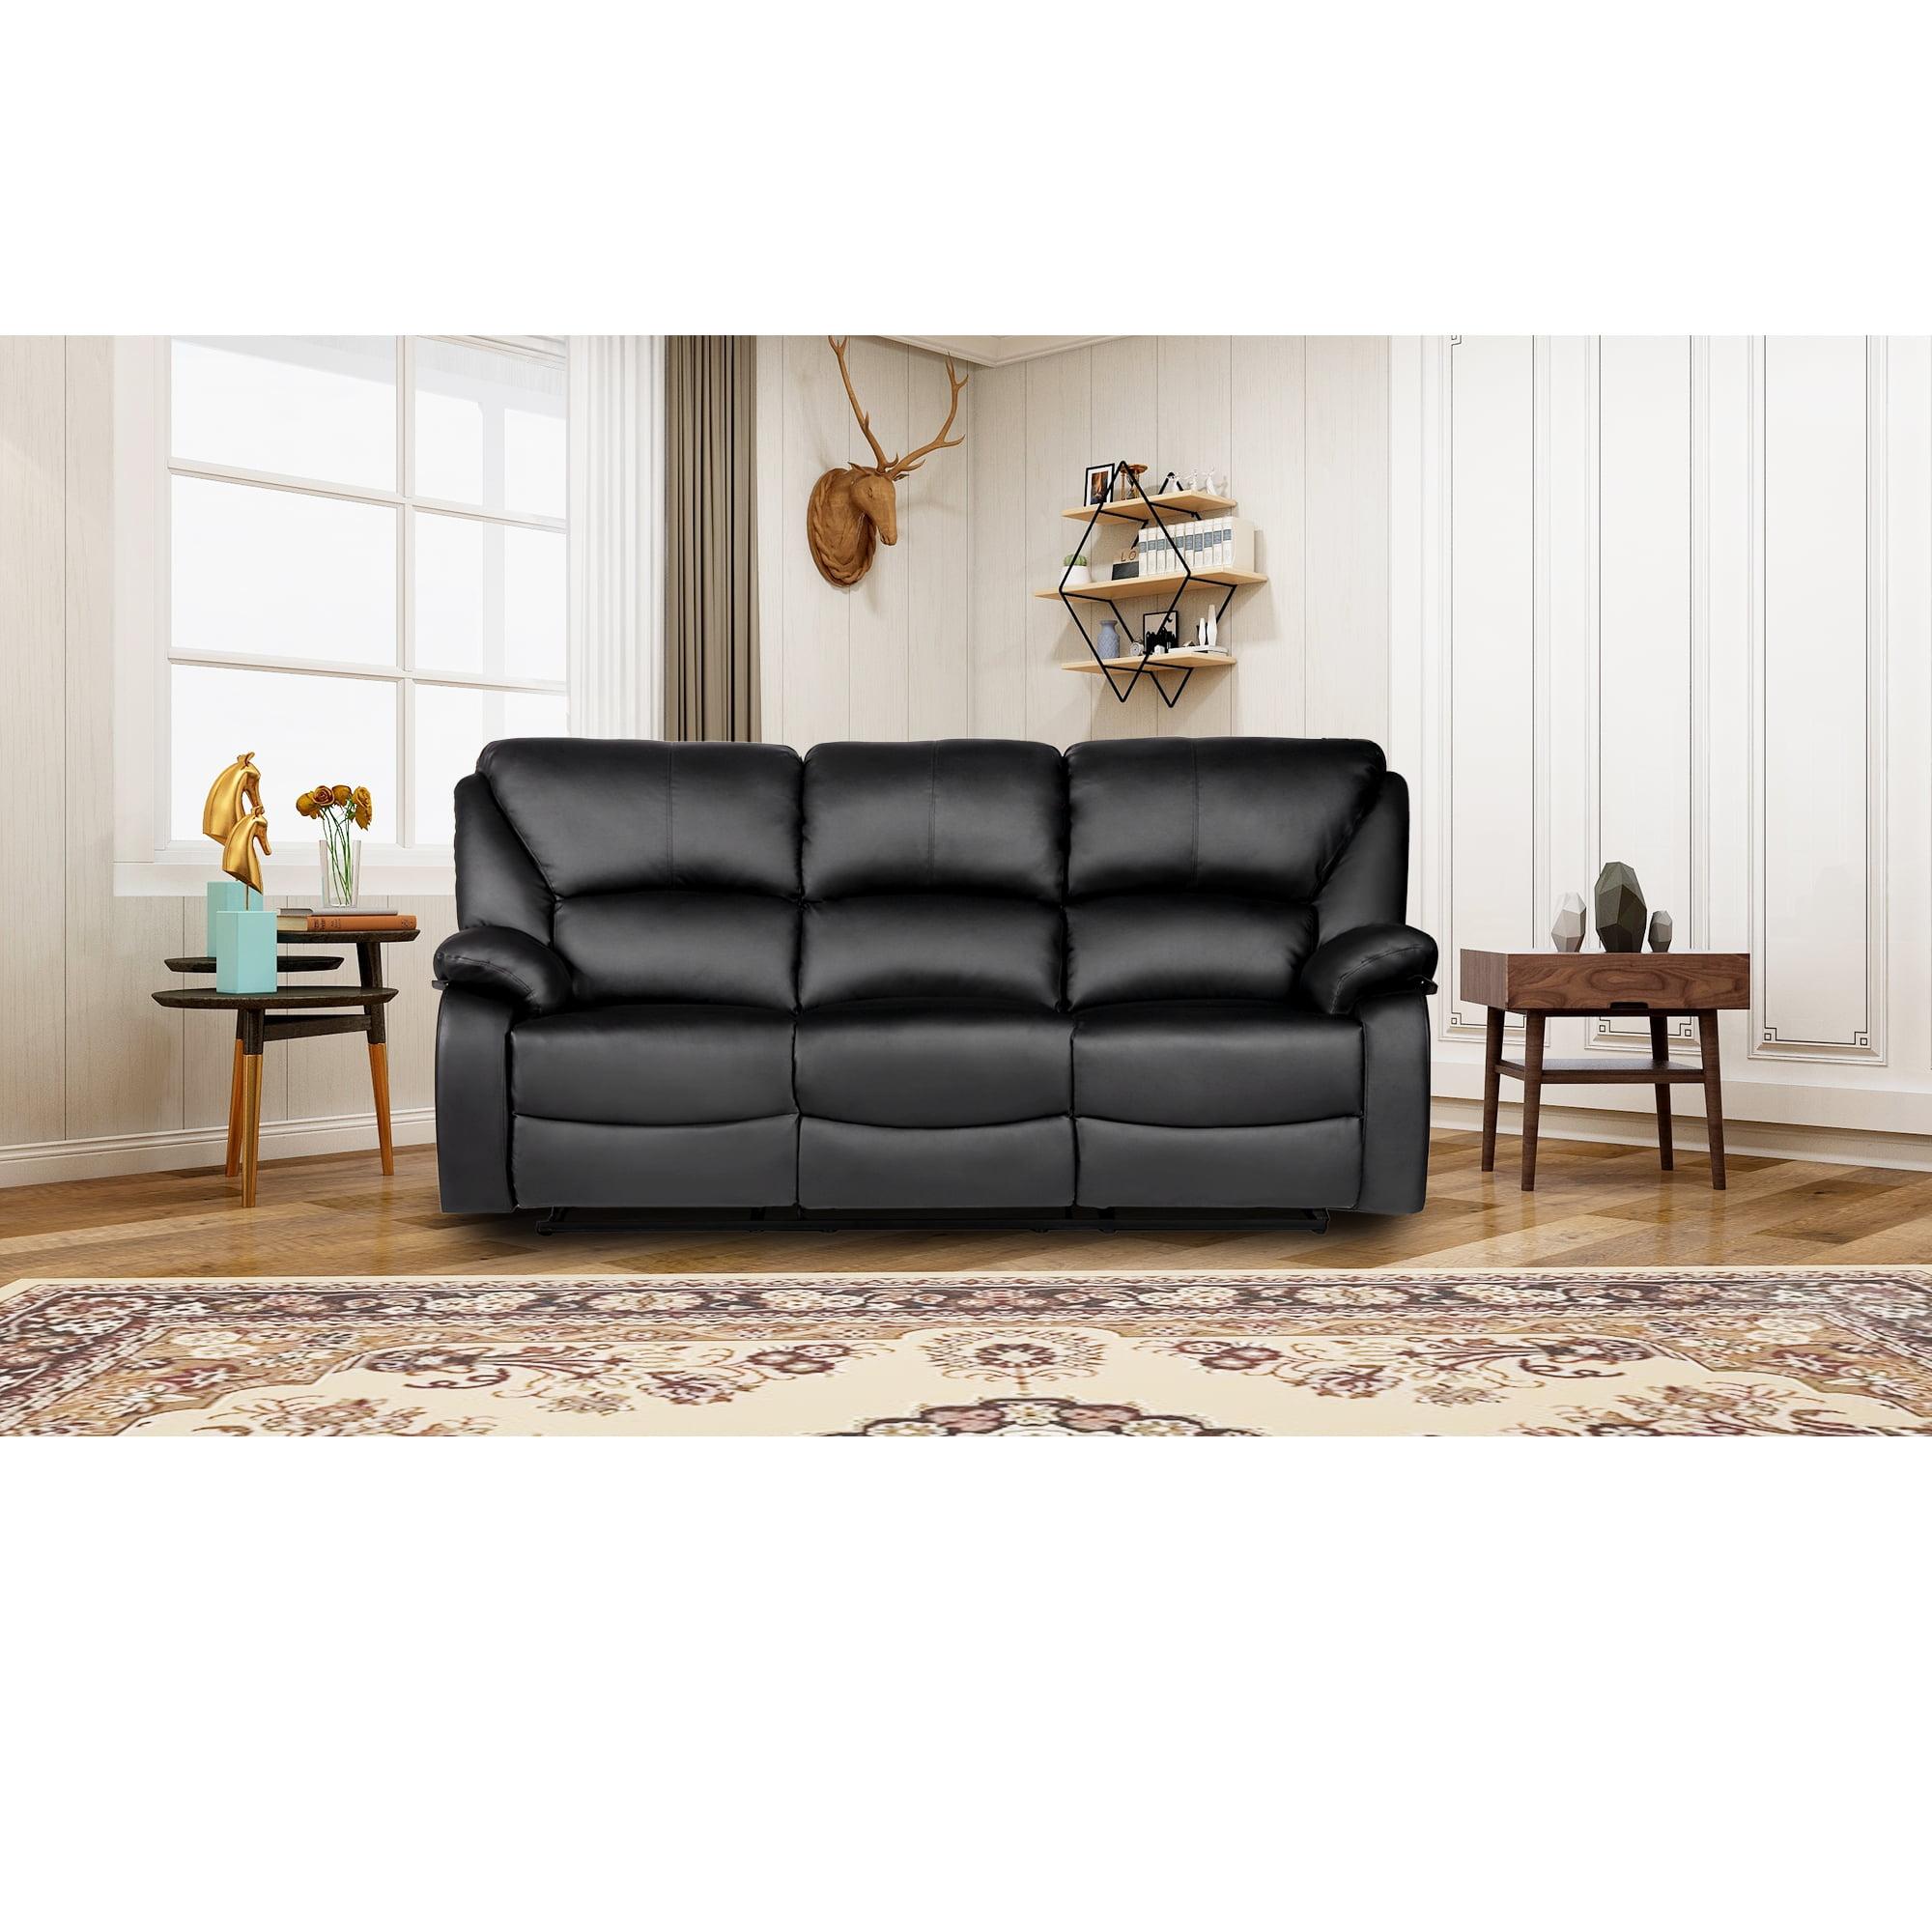 Harper & Bright Designs Home Theater Recliner PU Leather Reclining Sofa (Black)